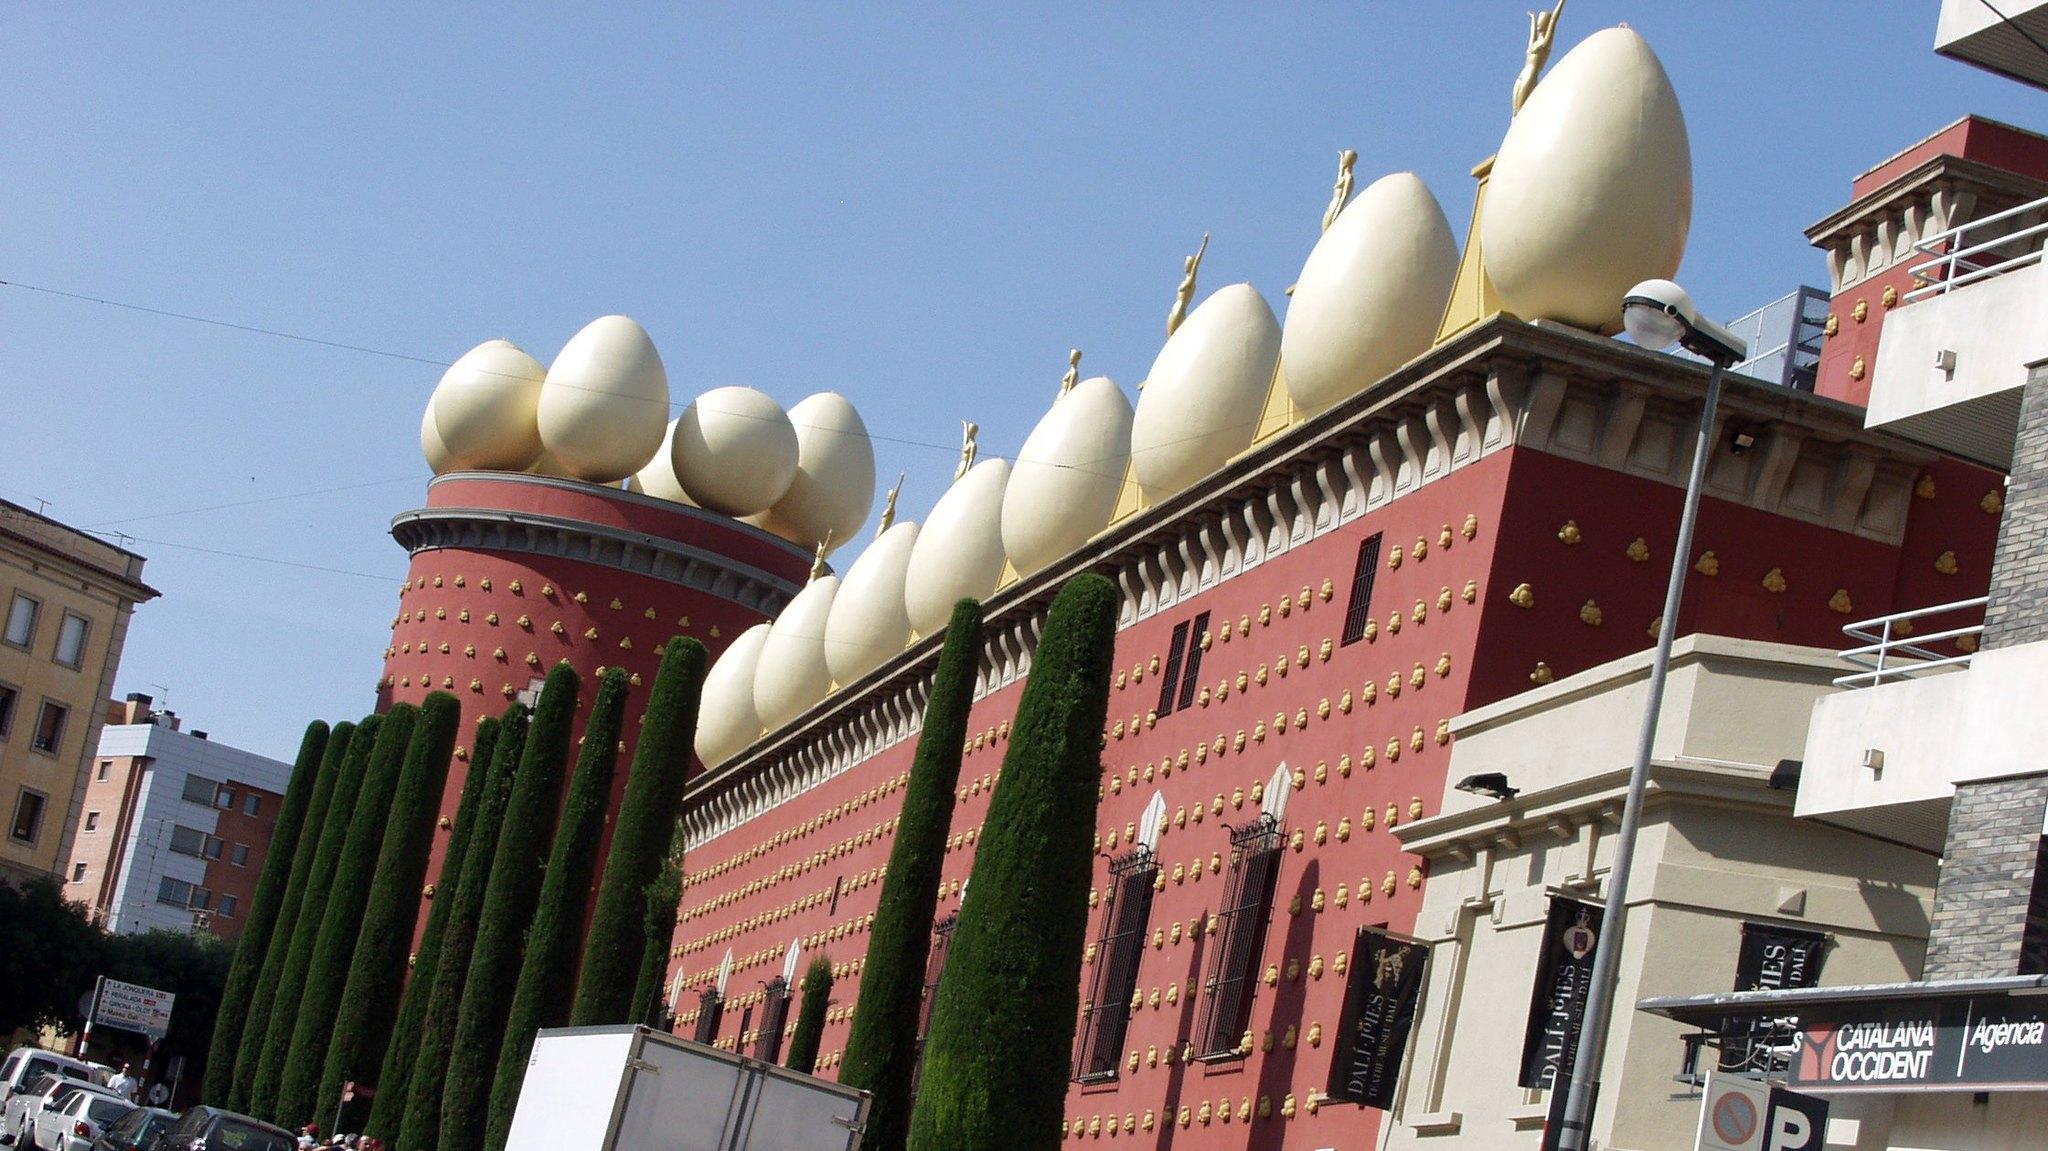 Figueres, Dali Museum